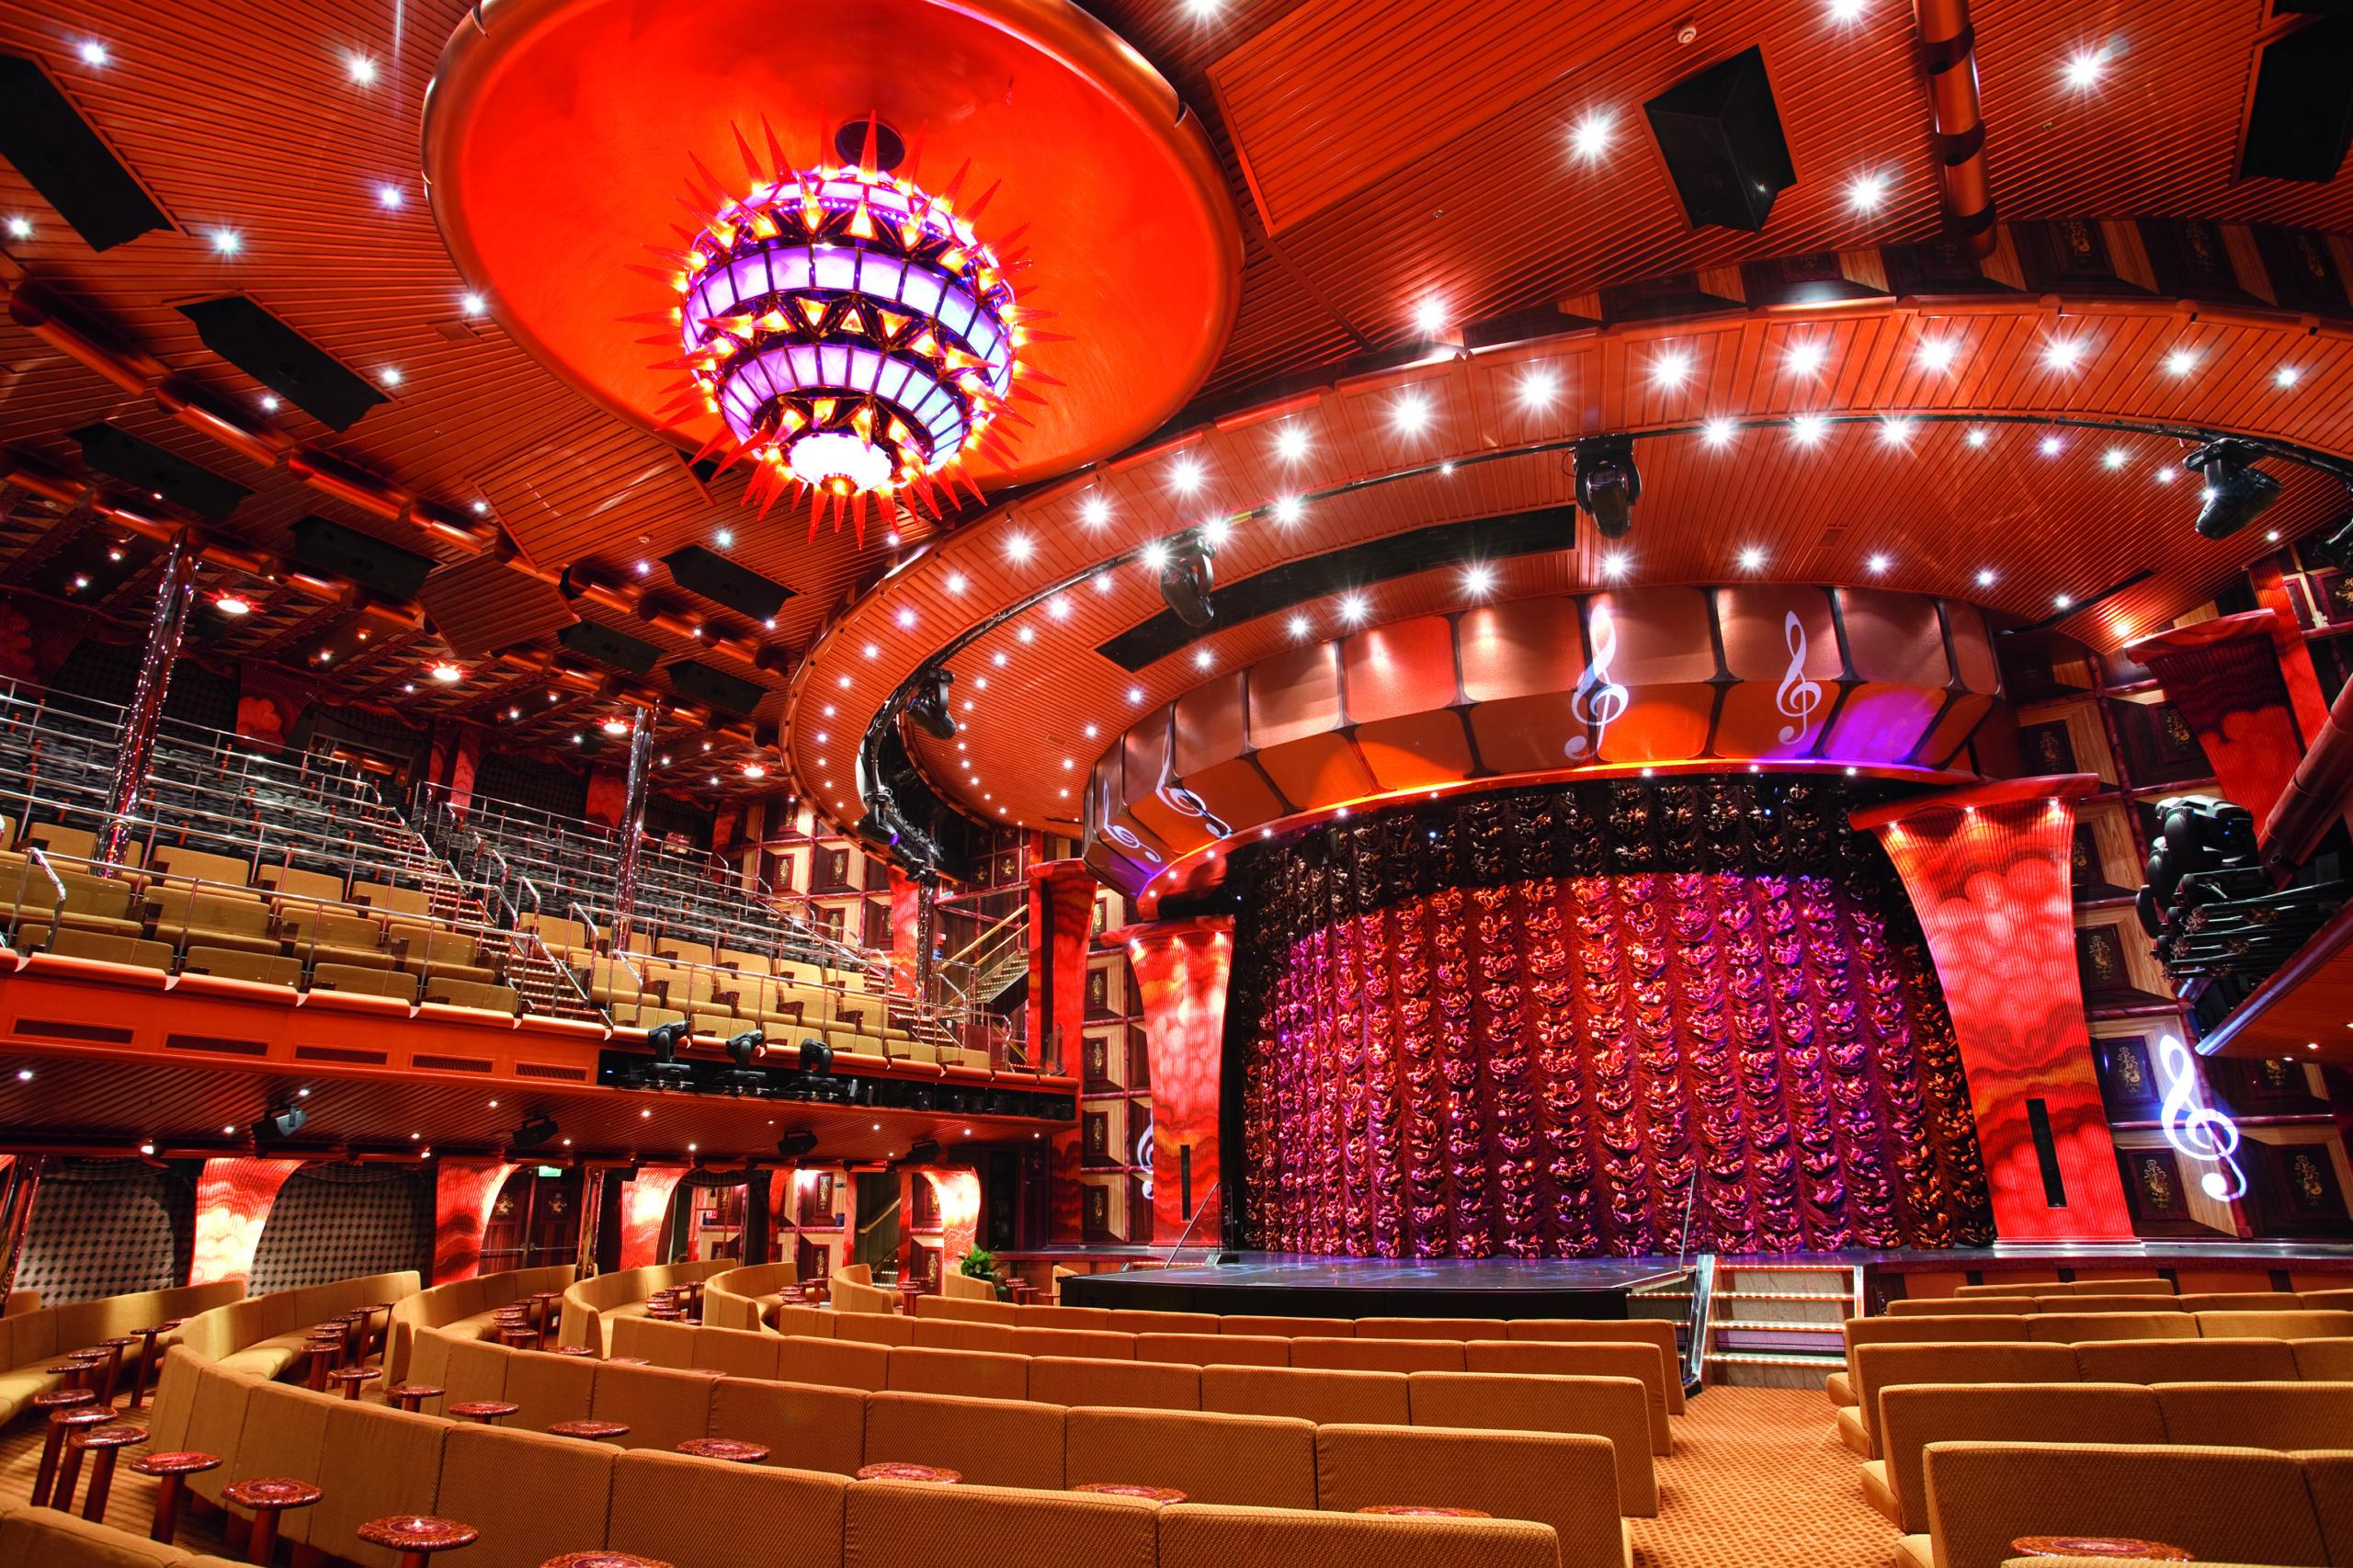 Cruiseschip-Costa Pacifica-Costa Cruises-Theater